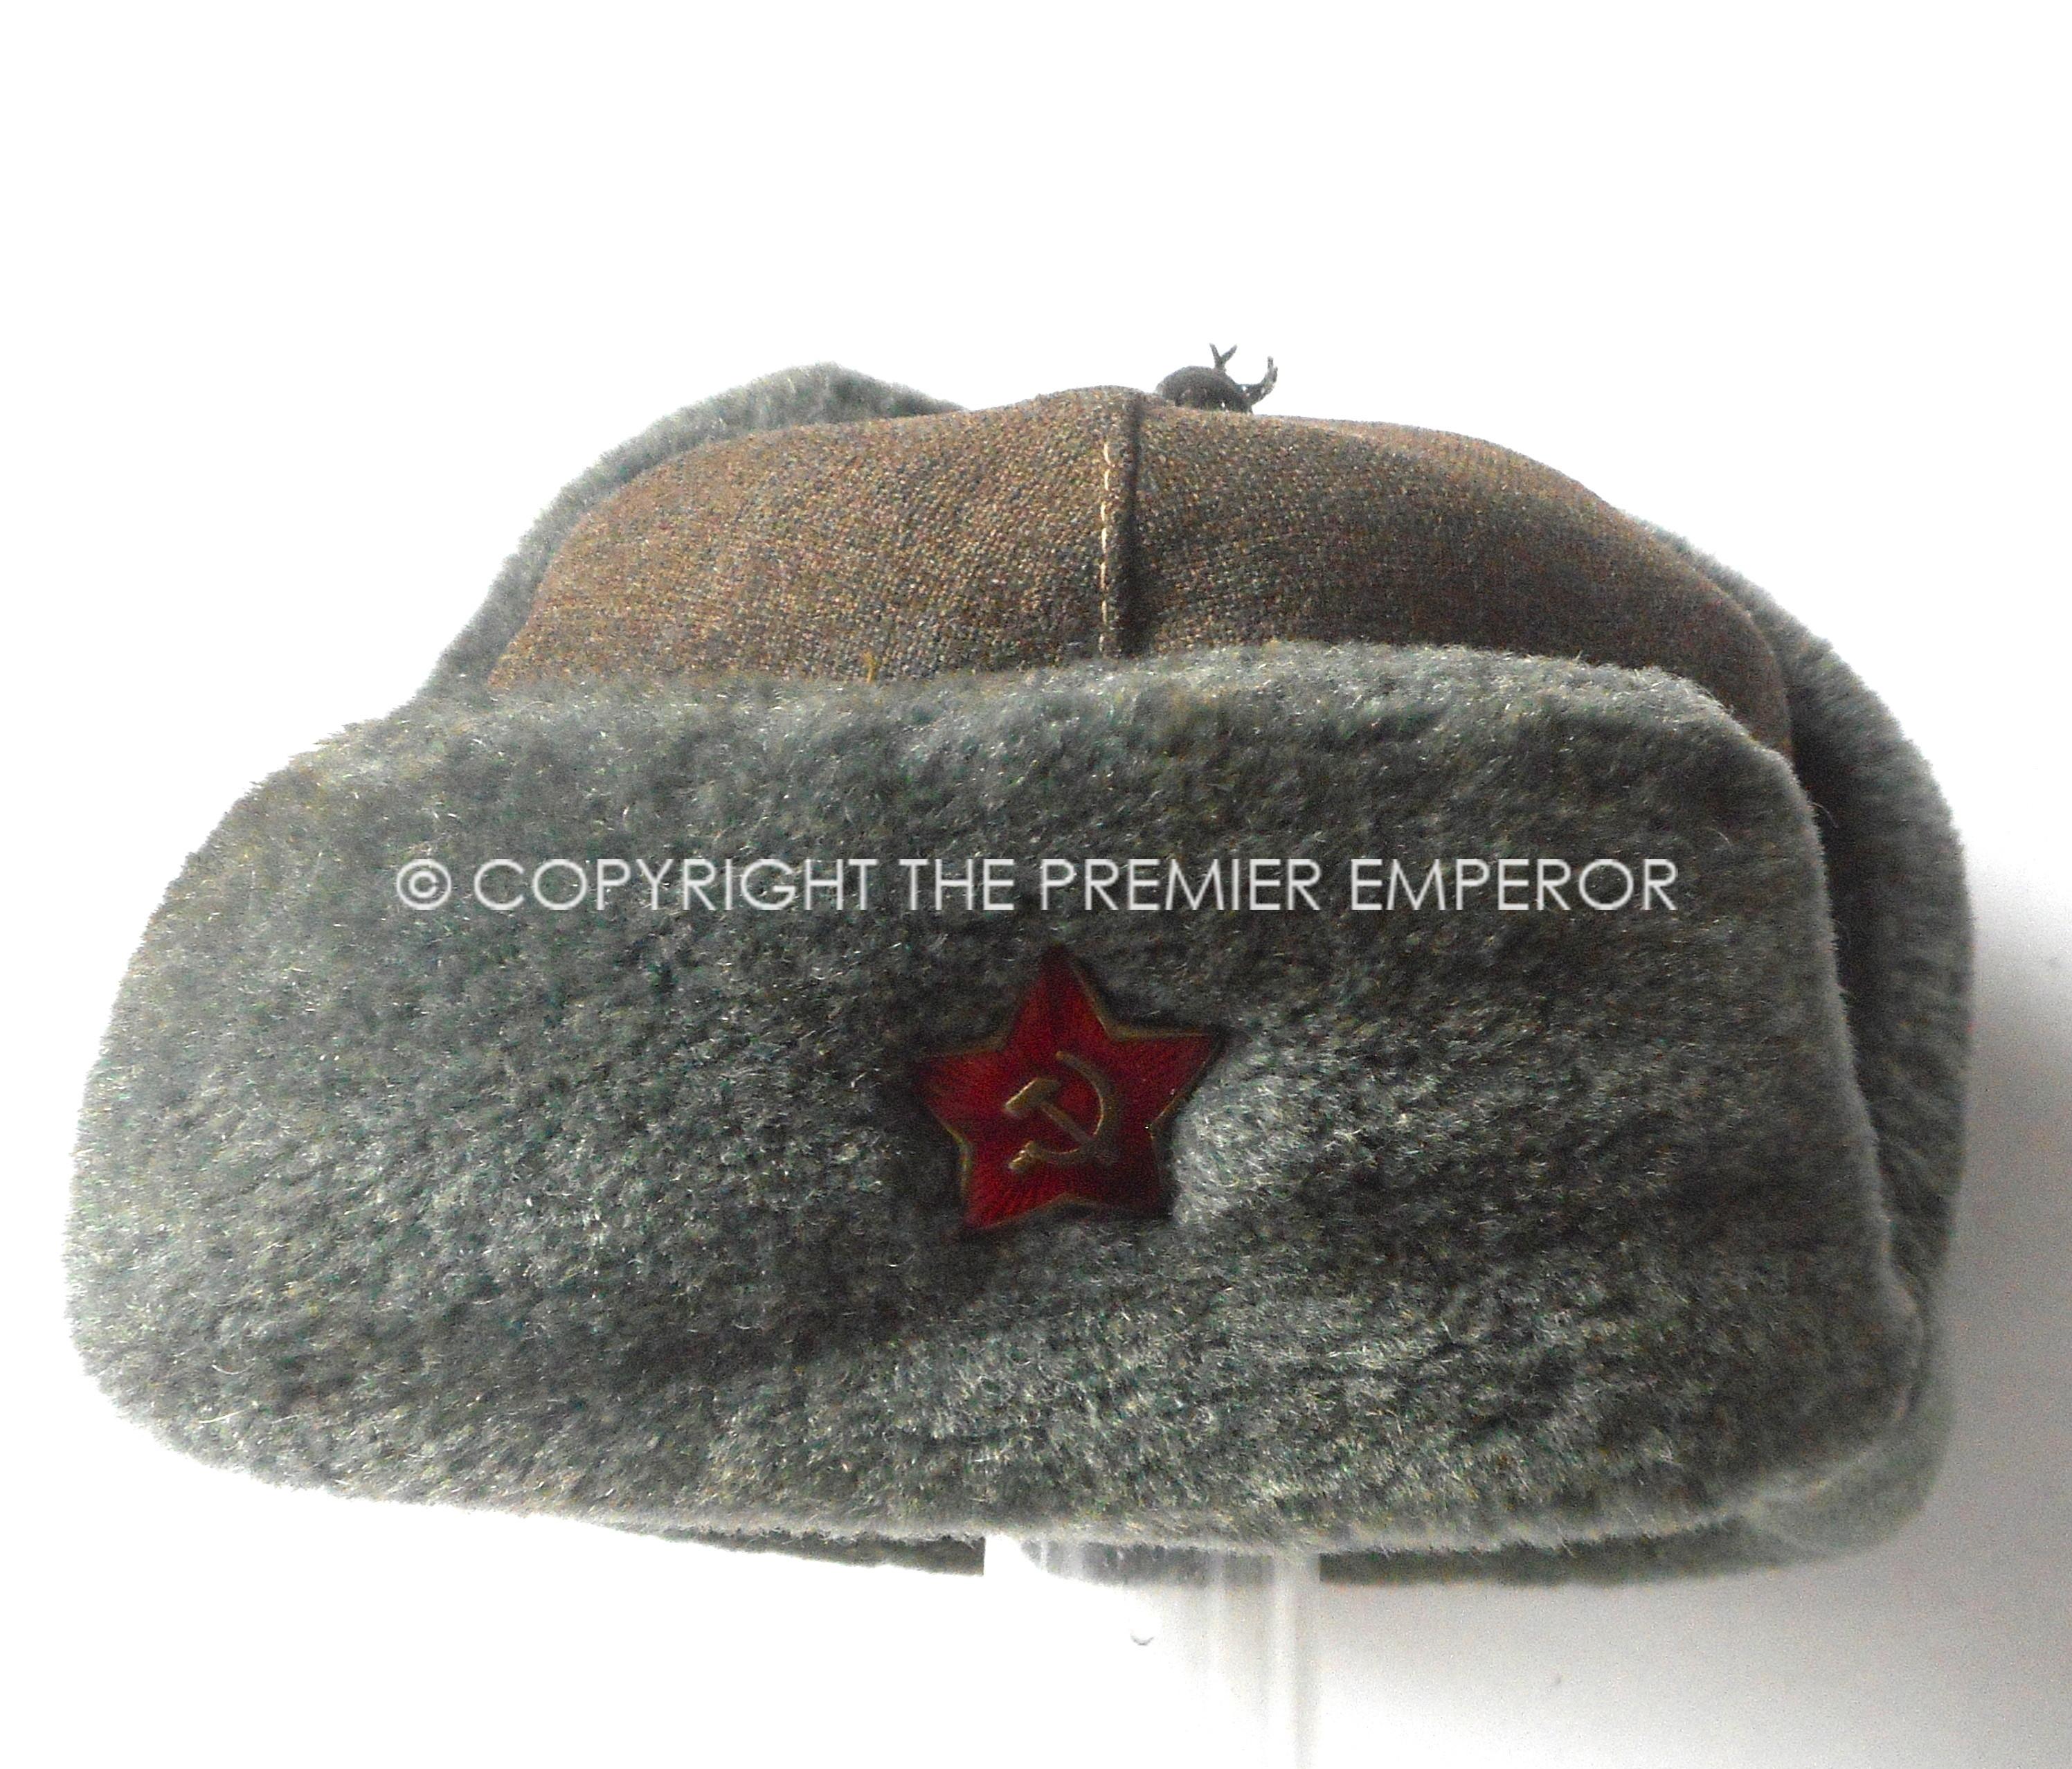 f4bdc1f701035 Russia  Soviet Red Army World war Two fur cap with insignia. Circa.1941-45  – Relic Militaria – Military Antiques and Memorabilia